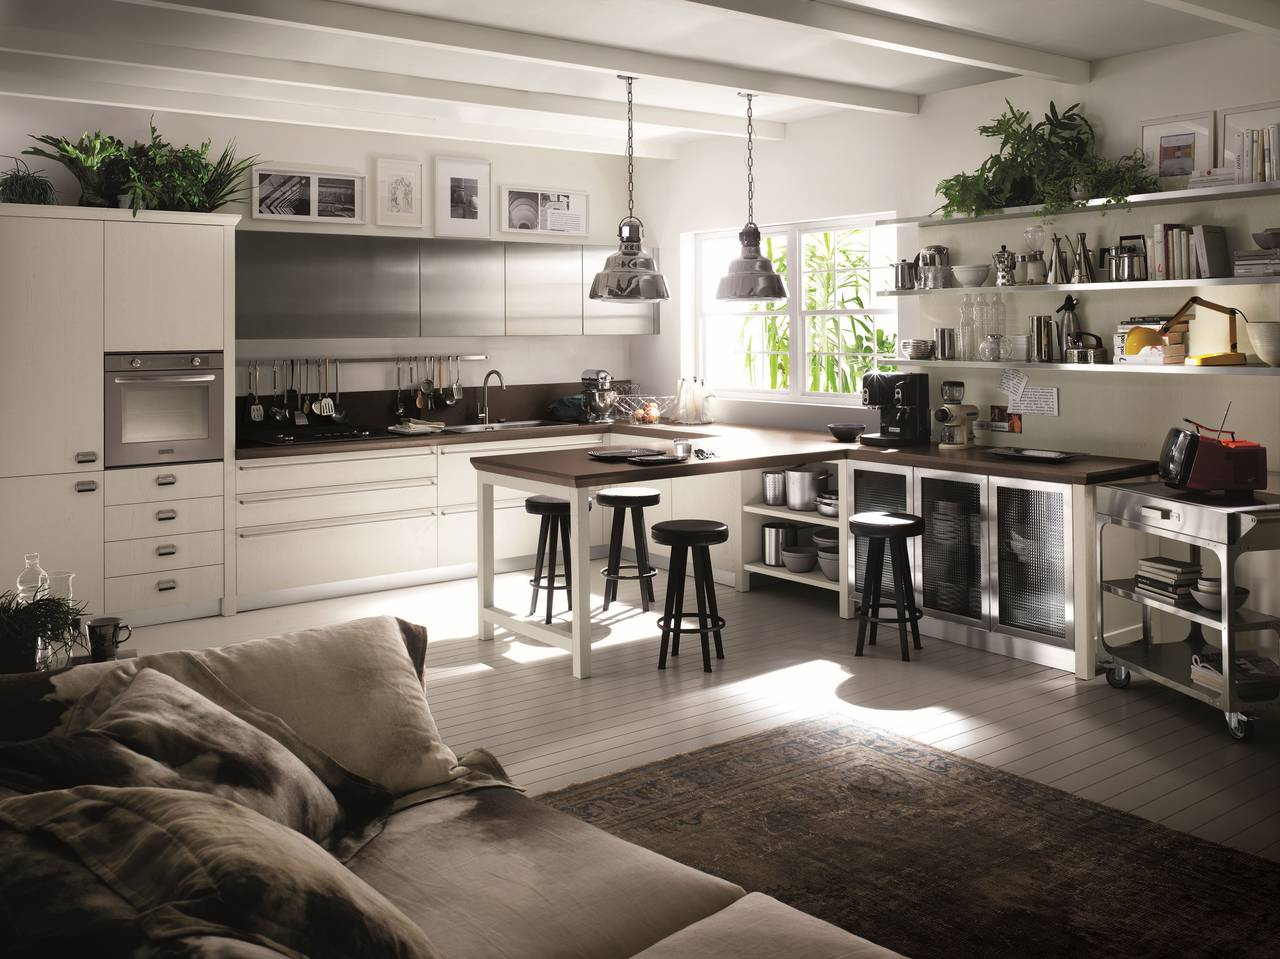 Atmosfere industriali per la cucina urbana ambiente cucina for Cucine in stile